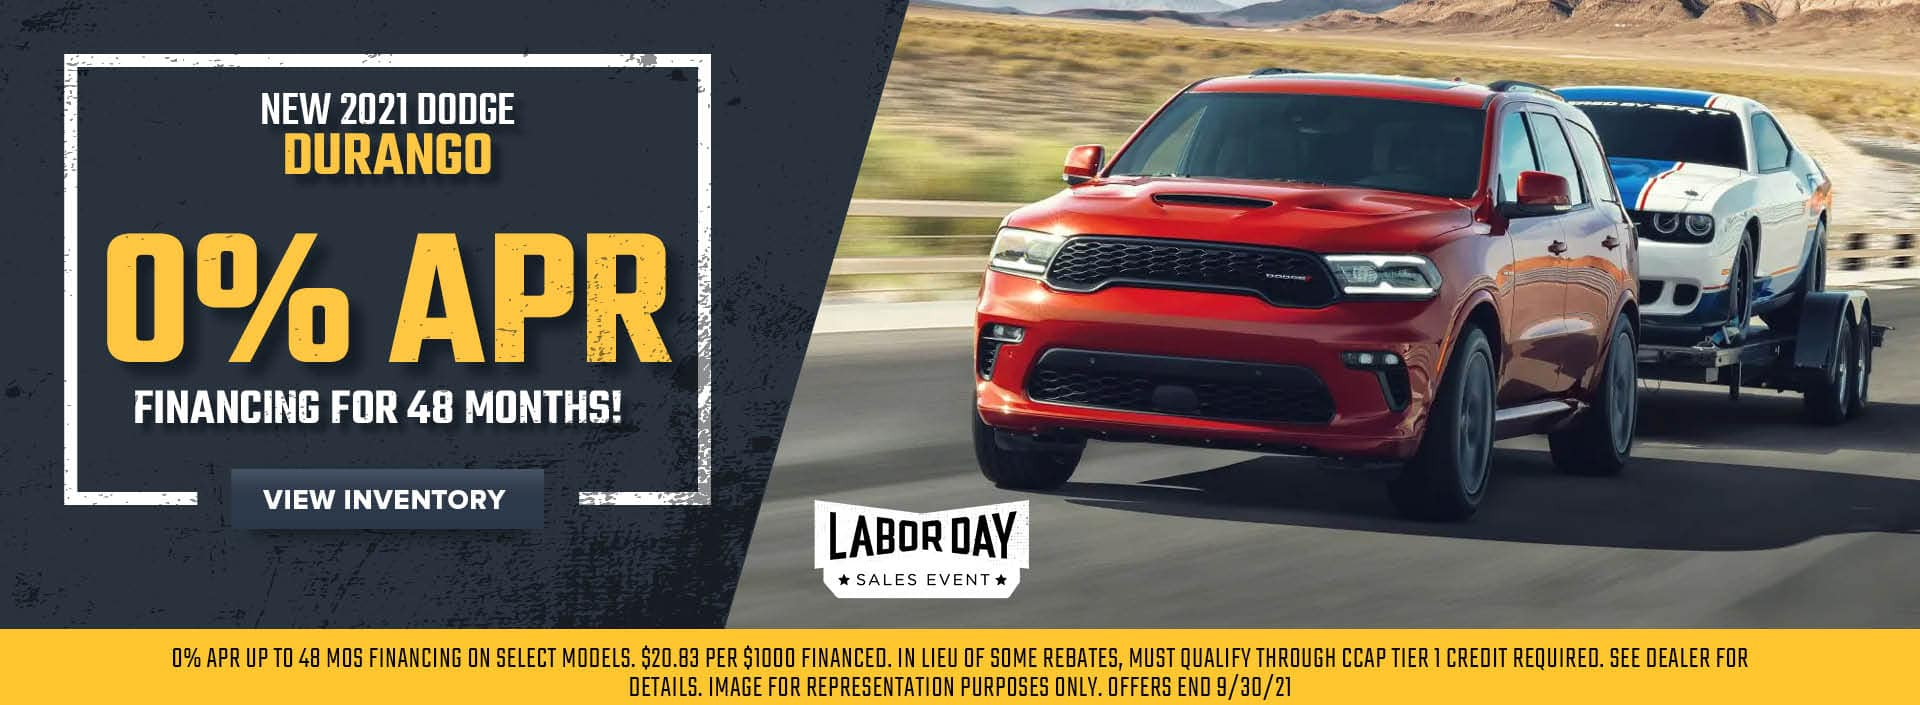 New 2021 Dodge Durango